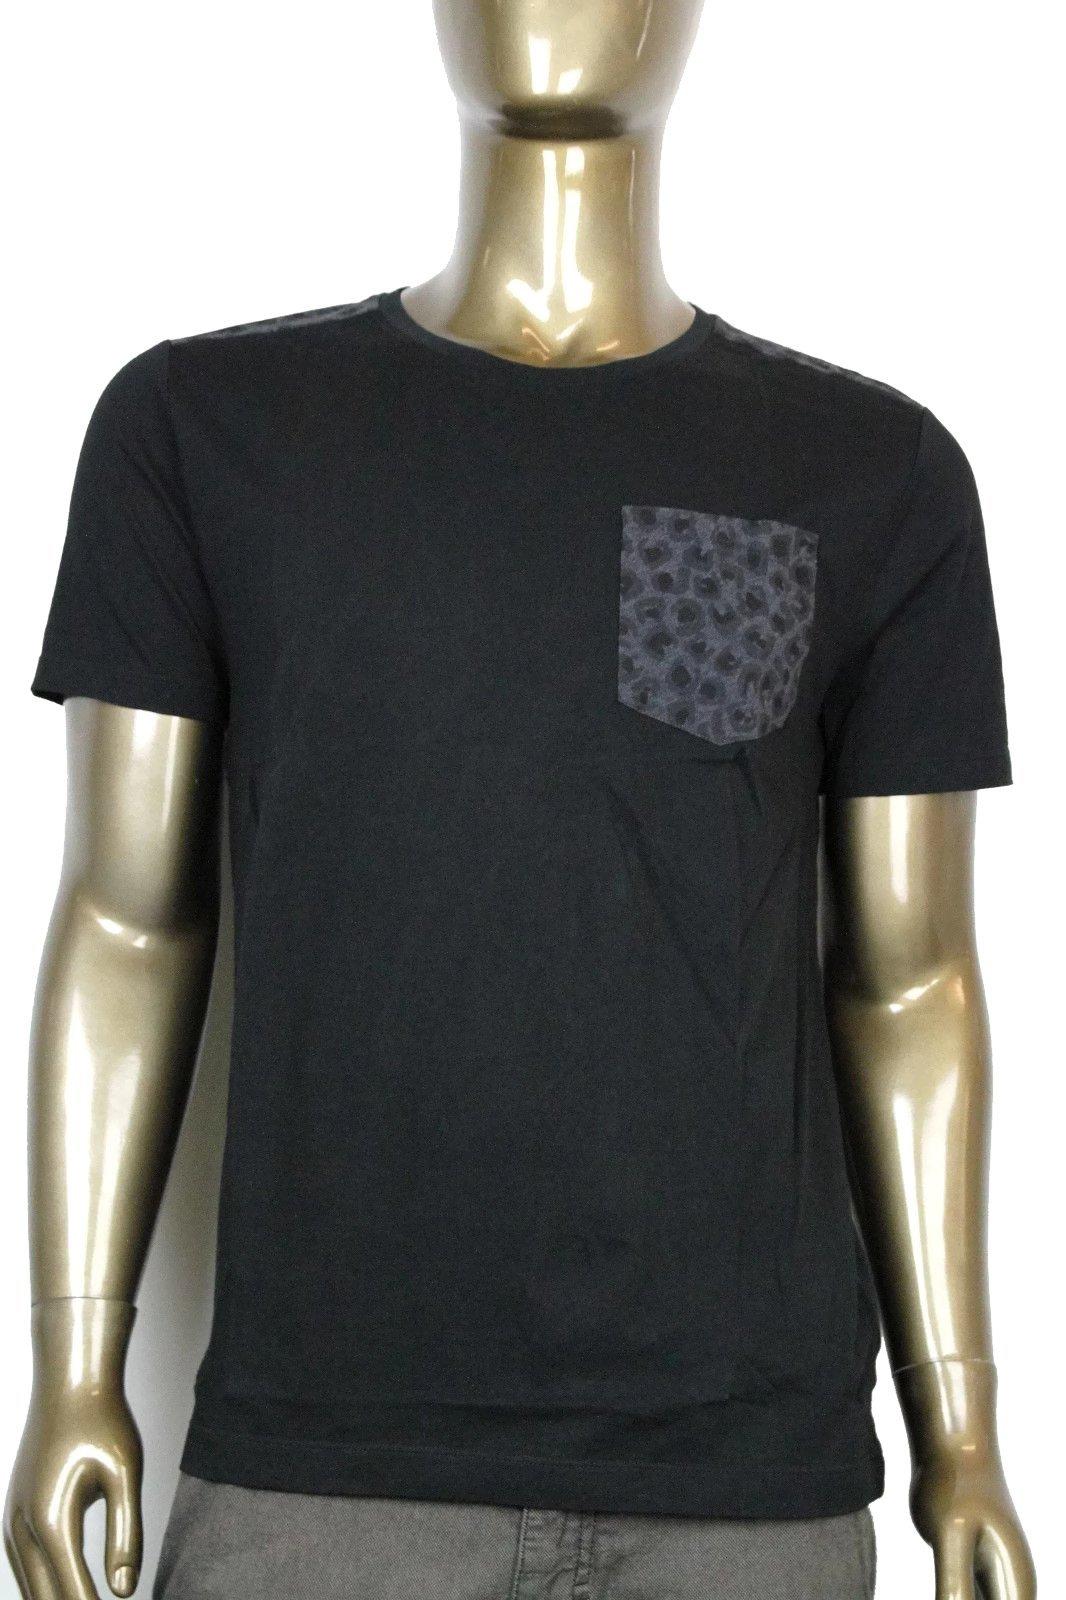 Gucci Men's Black Cotton With Leopard Print T Shirt 354513 1000 (2XL) by Gucci (Image #1)